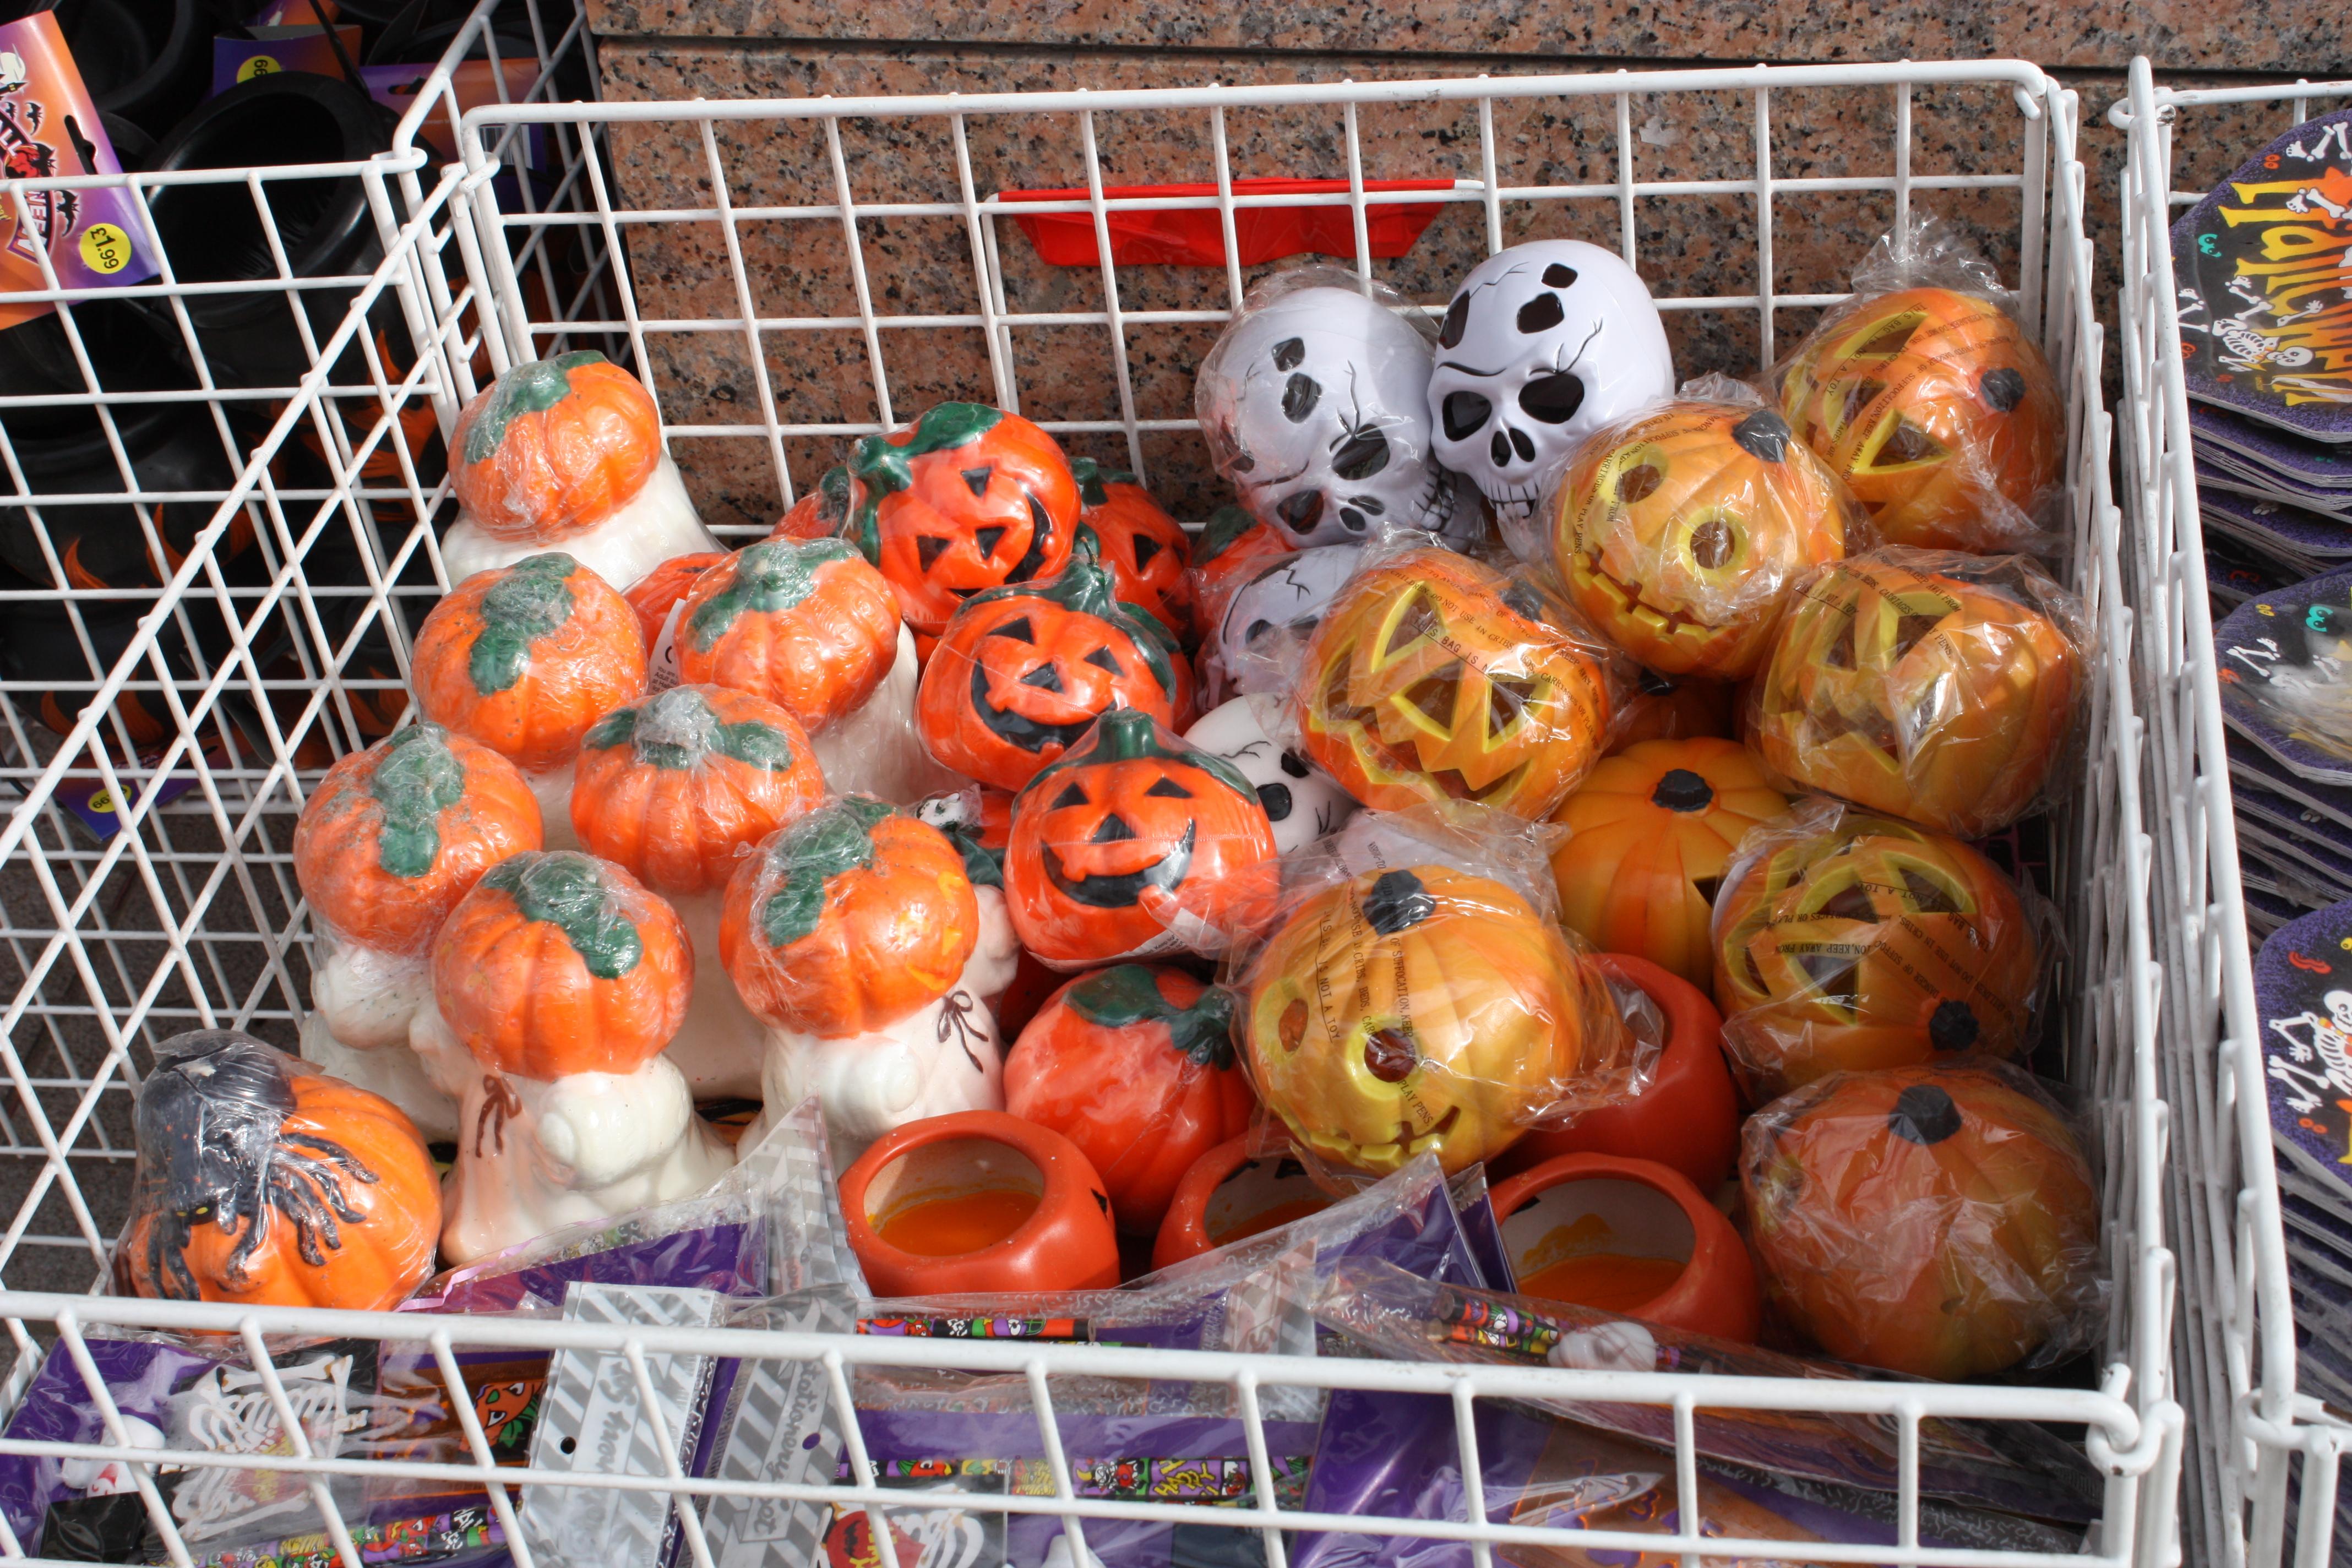 File:Halloween Shop, Derry, September 2010 (03).JPG - Wikimedia ...